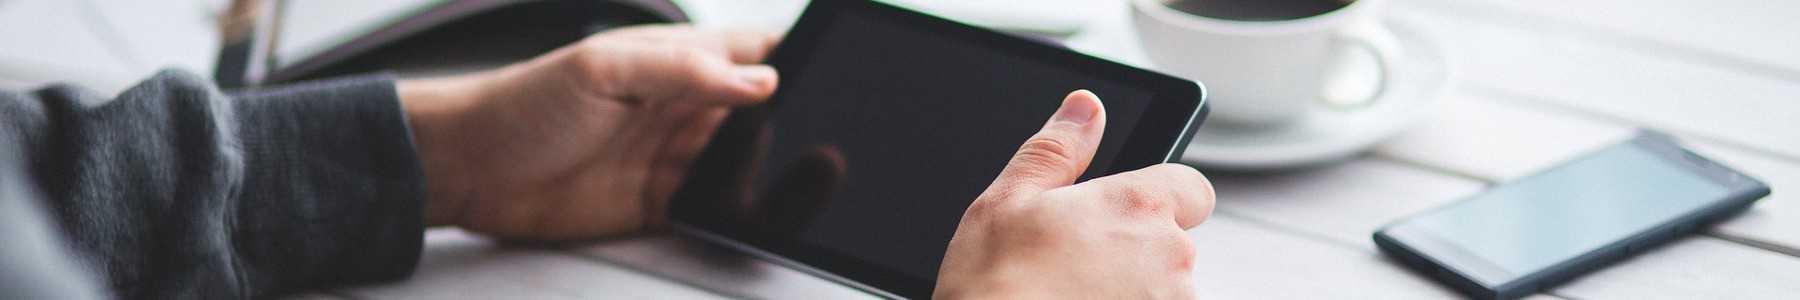 Tablette & Smartphone